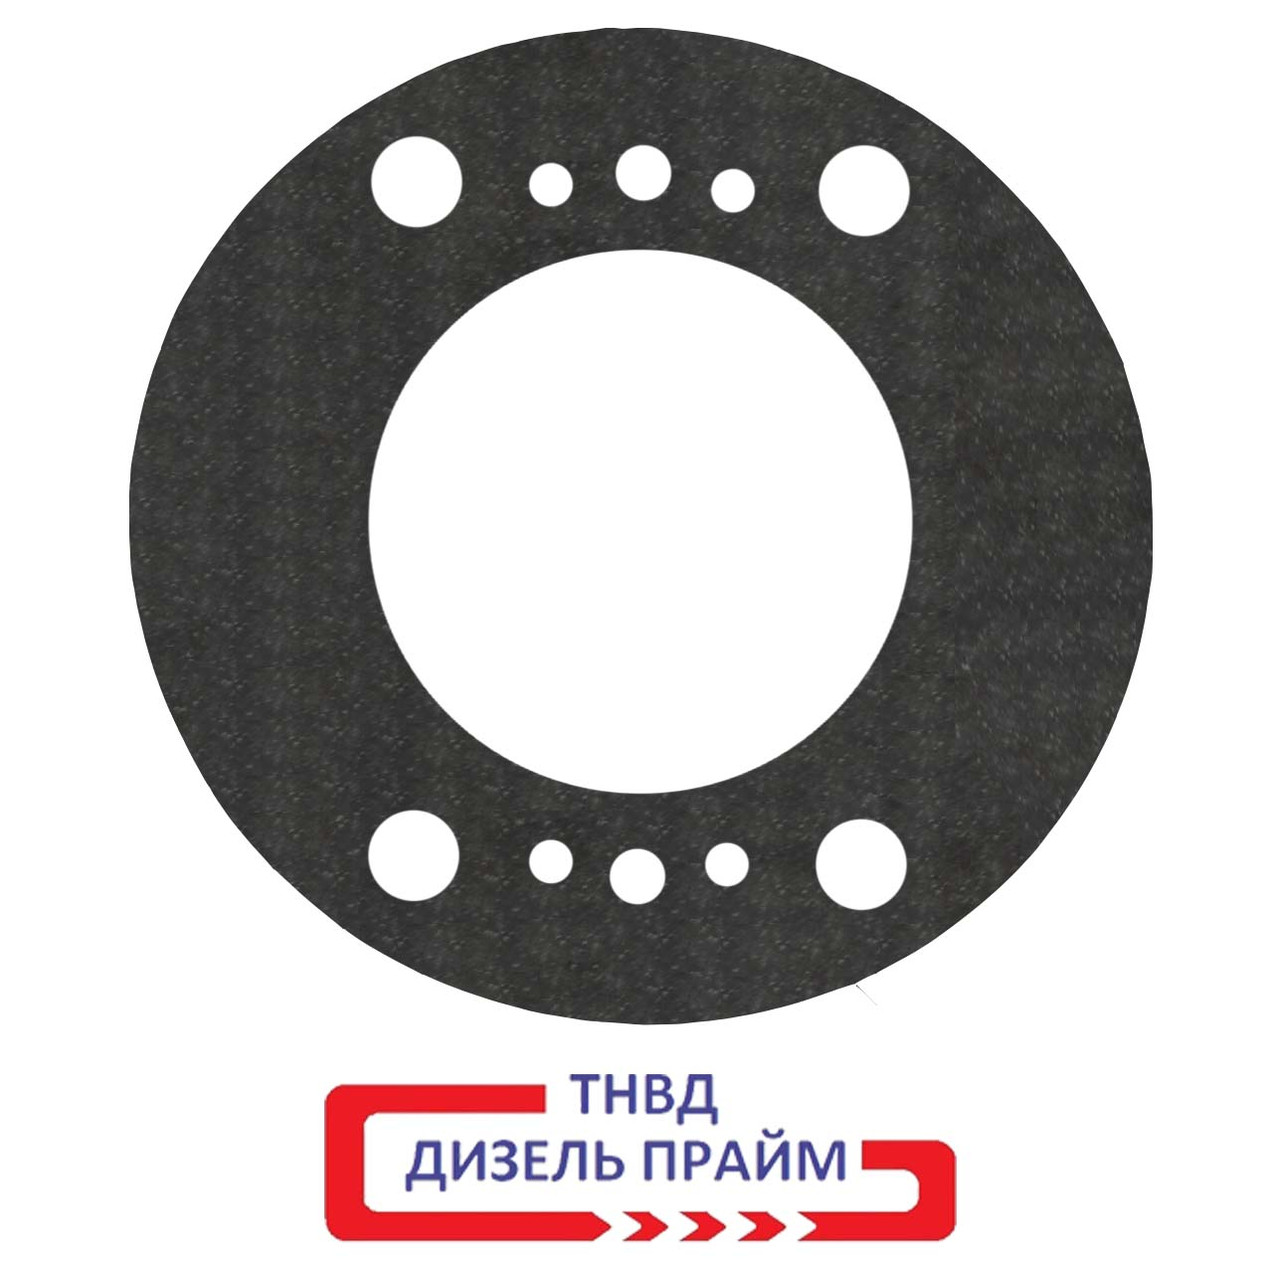 Прокладка фланца, 4УТНМ-1111493-01